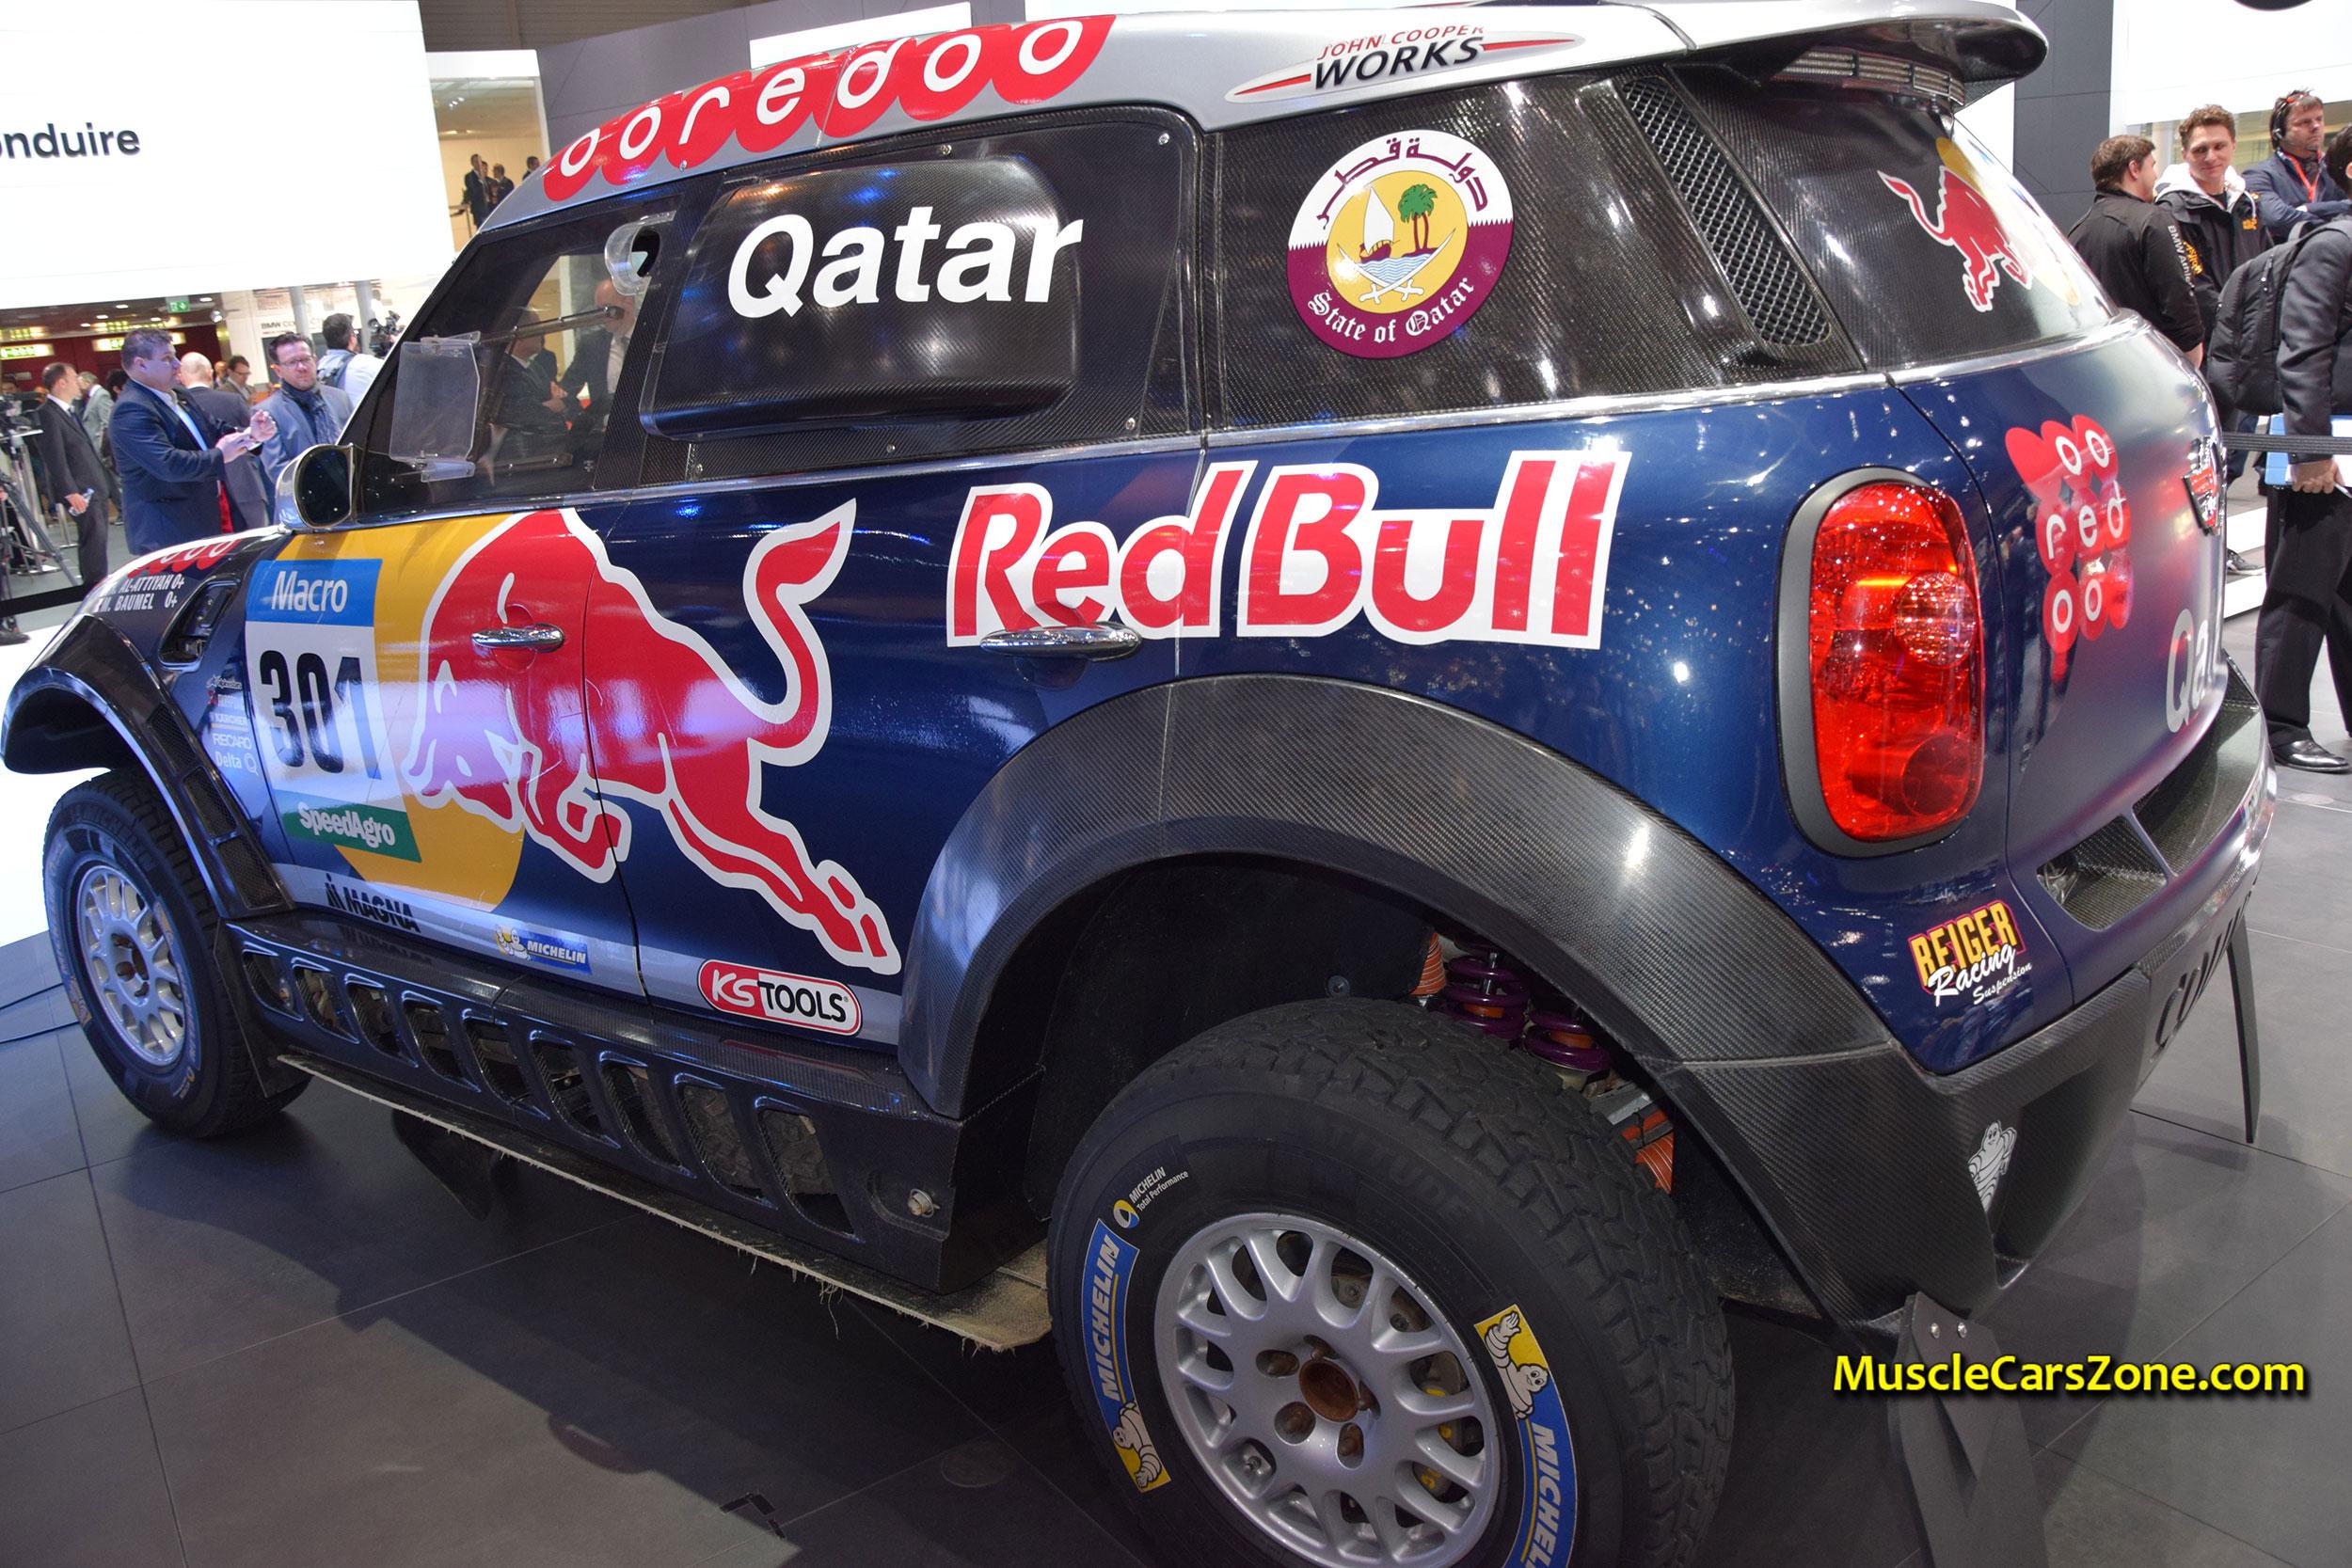 2015-MINI-Rally-Car-Dakar-Rally-01-2015-Geneva-Motor-Show - Muscle ...